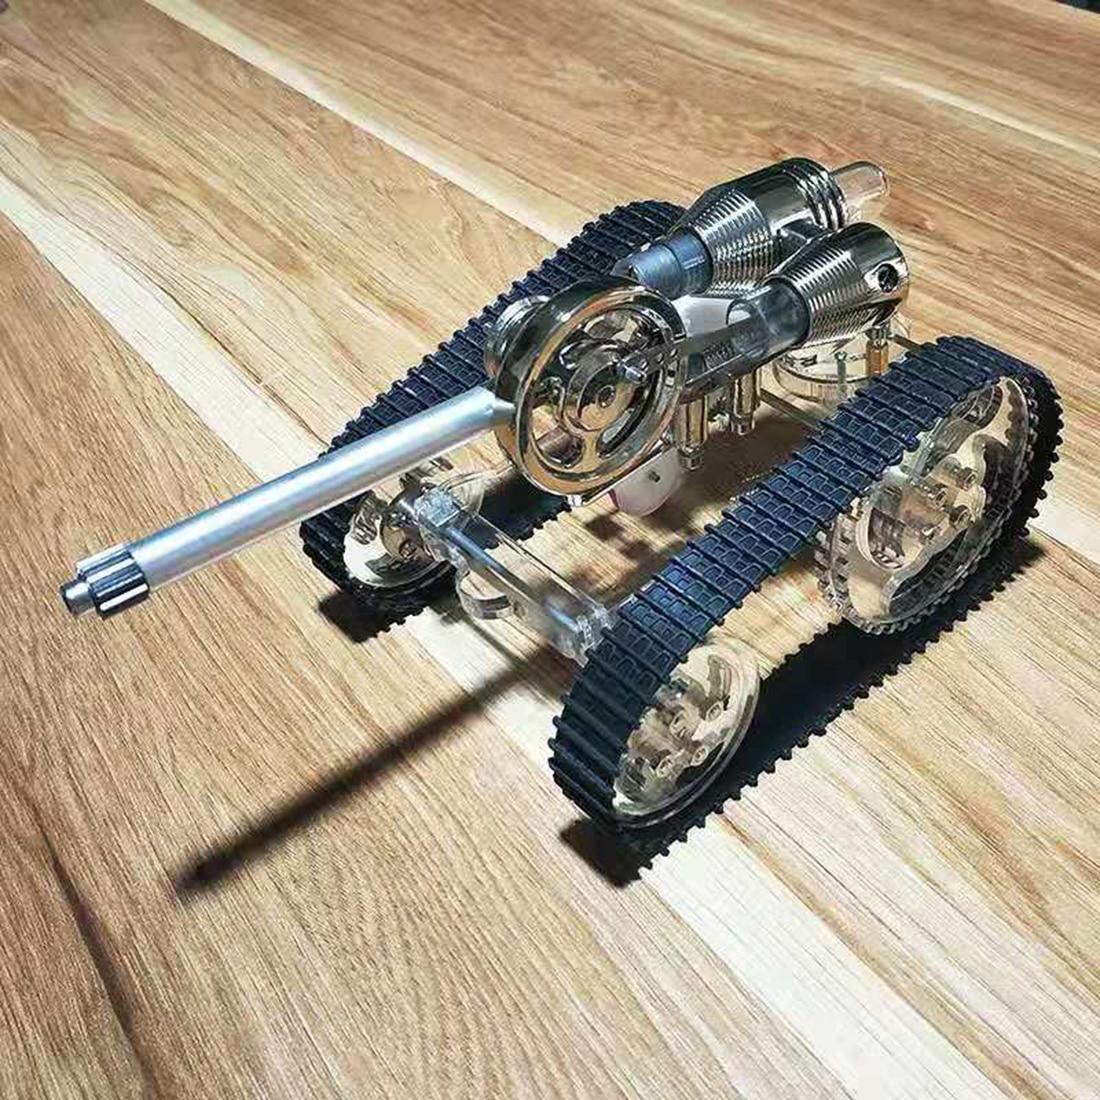 Tank Stirling Engine Model External Combustion Engine Science Educational Kits